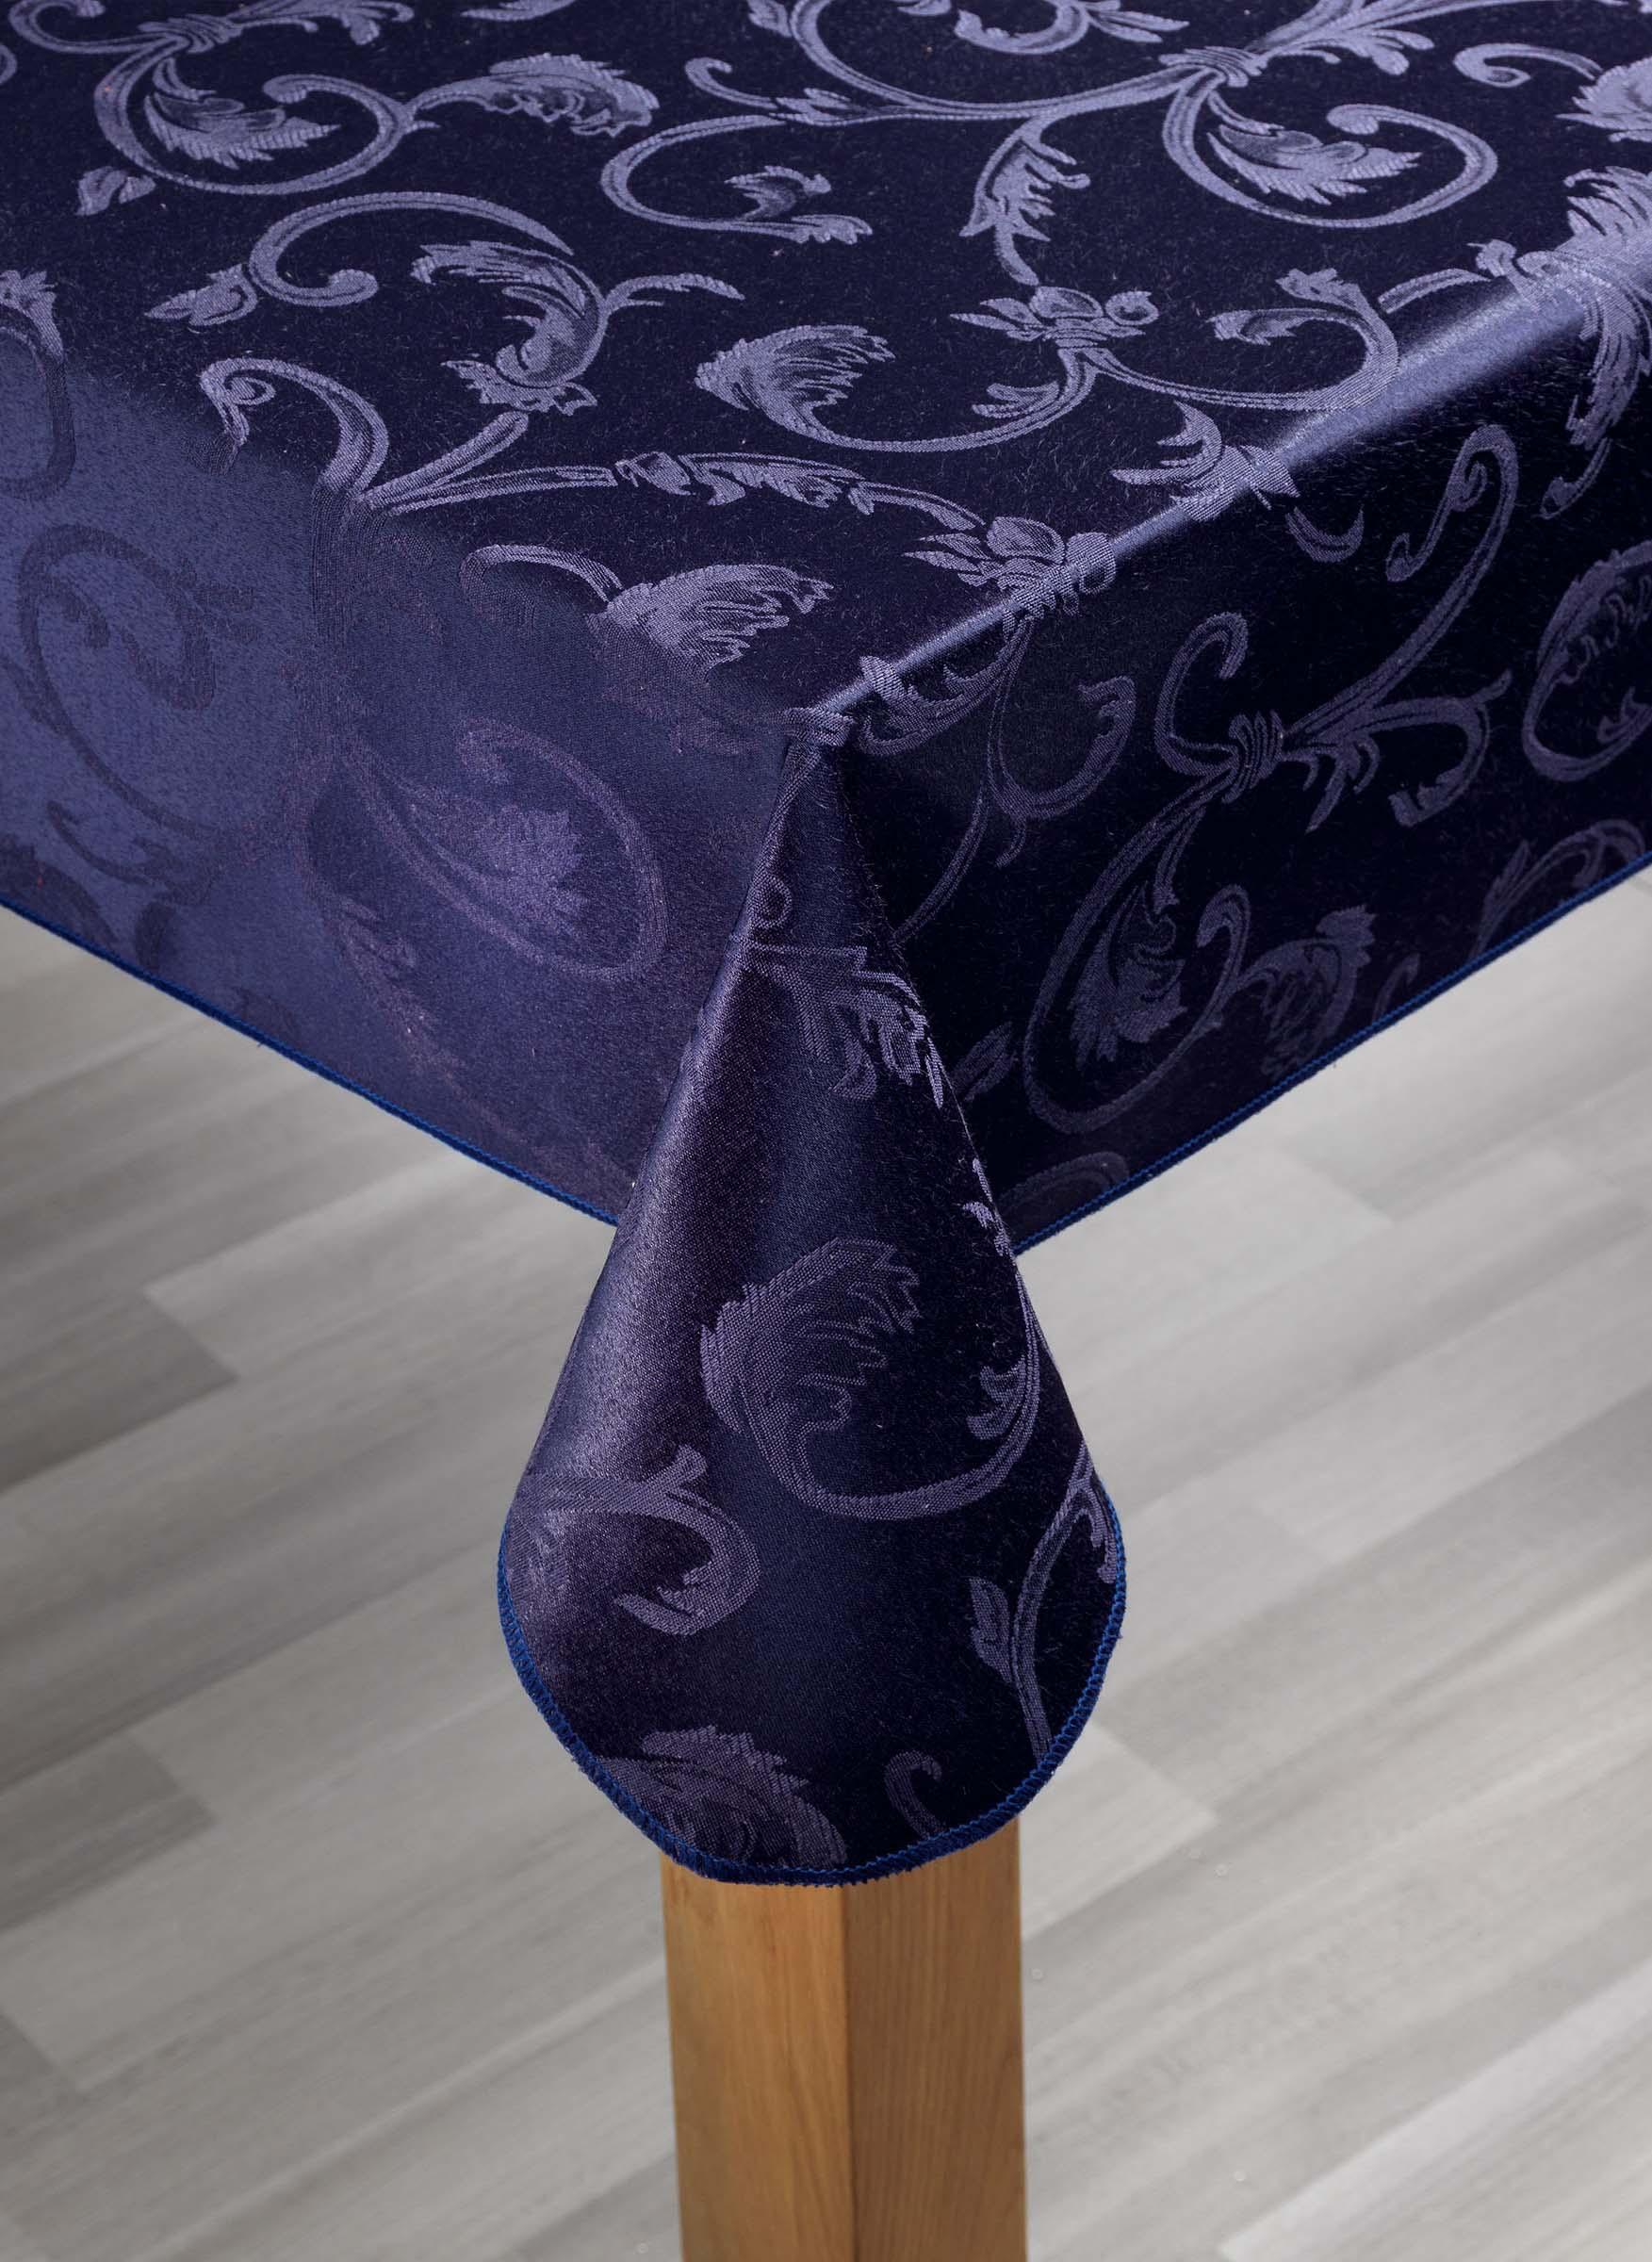 satin tischdecke jacquard floralmuster. Black Bedroom Furniture Sets. Home Design Ideas